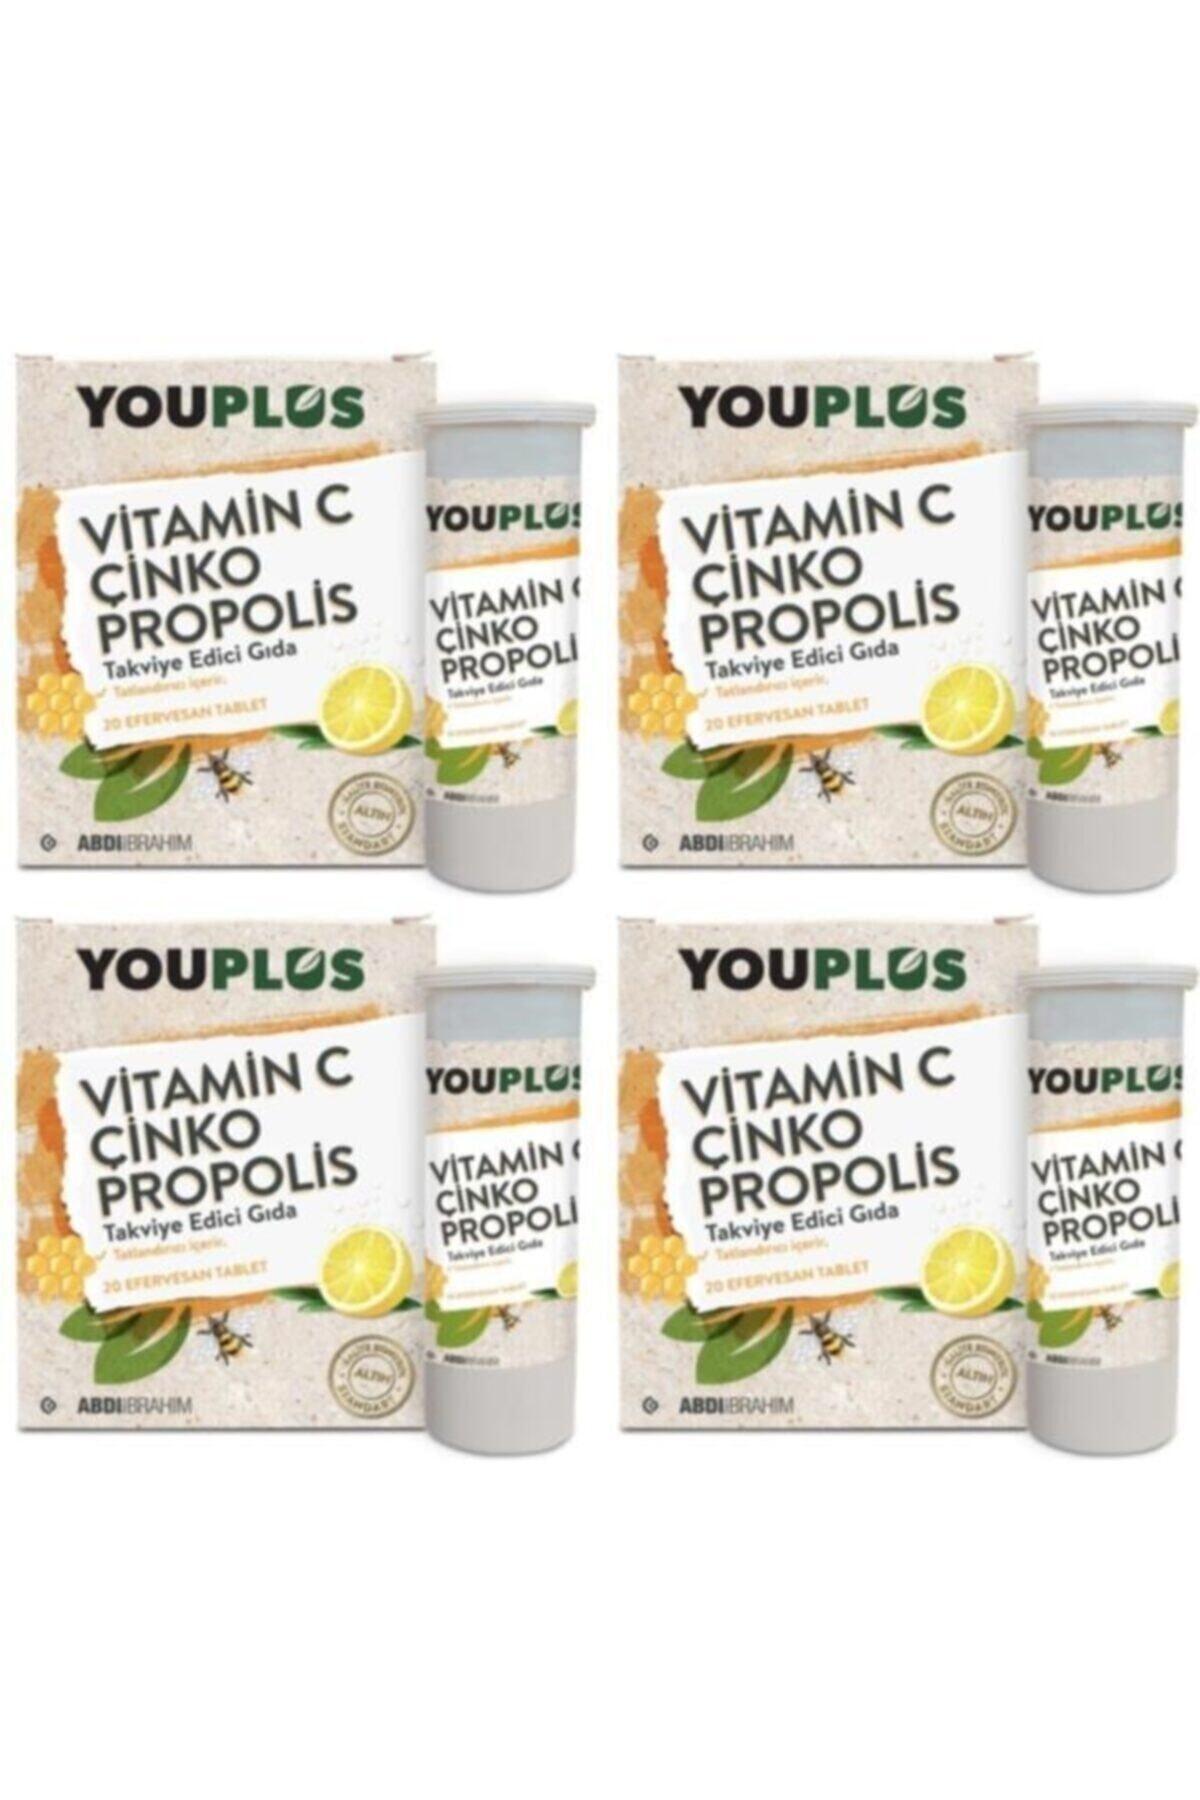 Youplus C Çinko Propolis 20 Efervesan Tablet 4'lü Vitamin 1